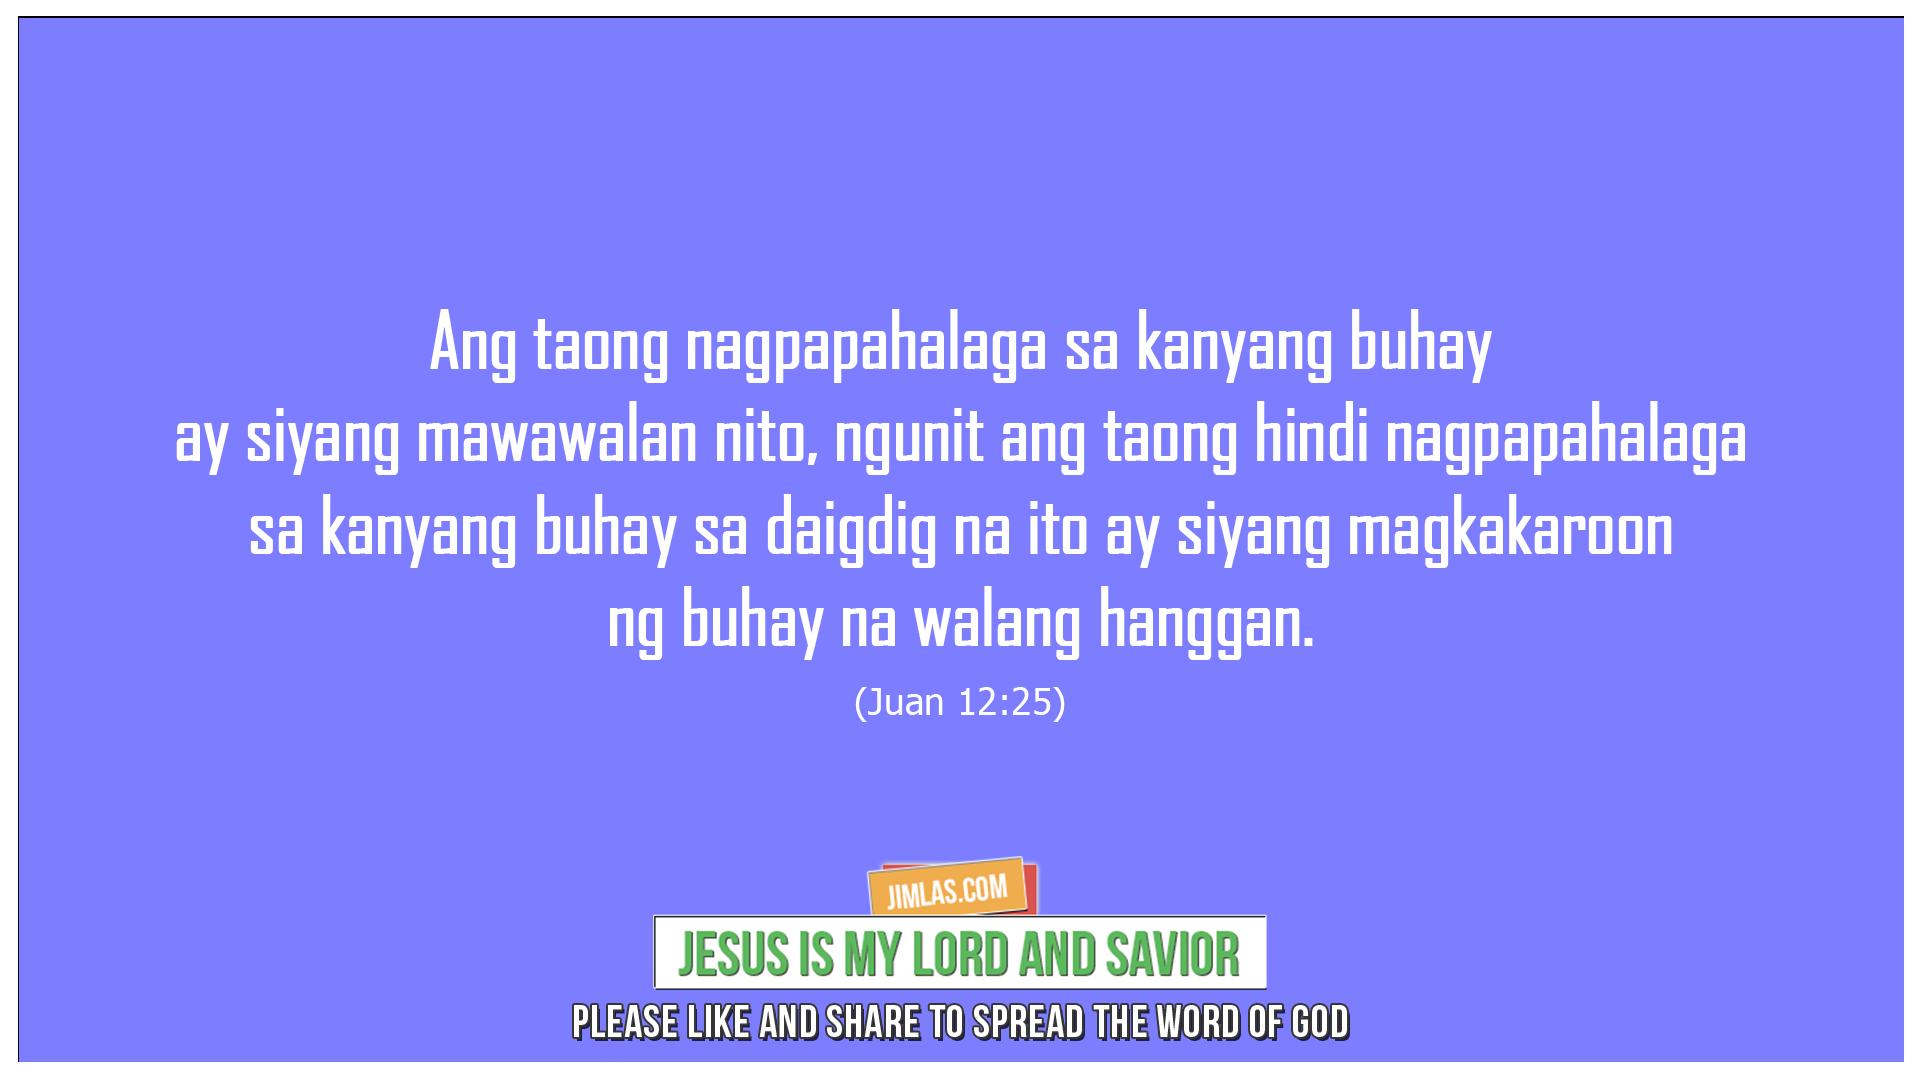 Juan 12 25, Juan 12:25